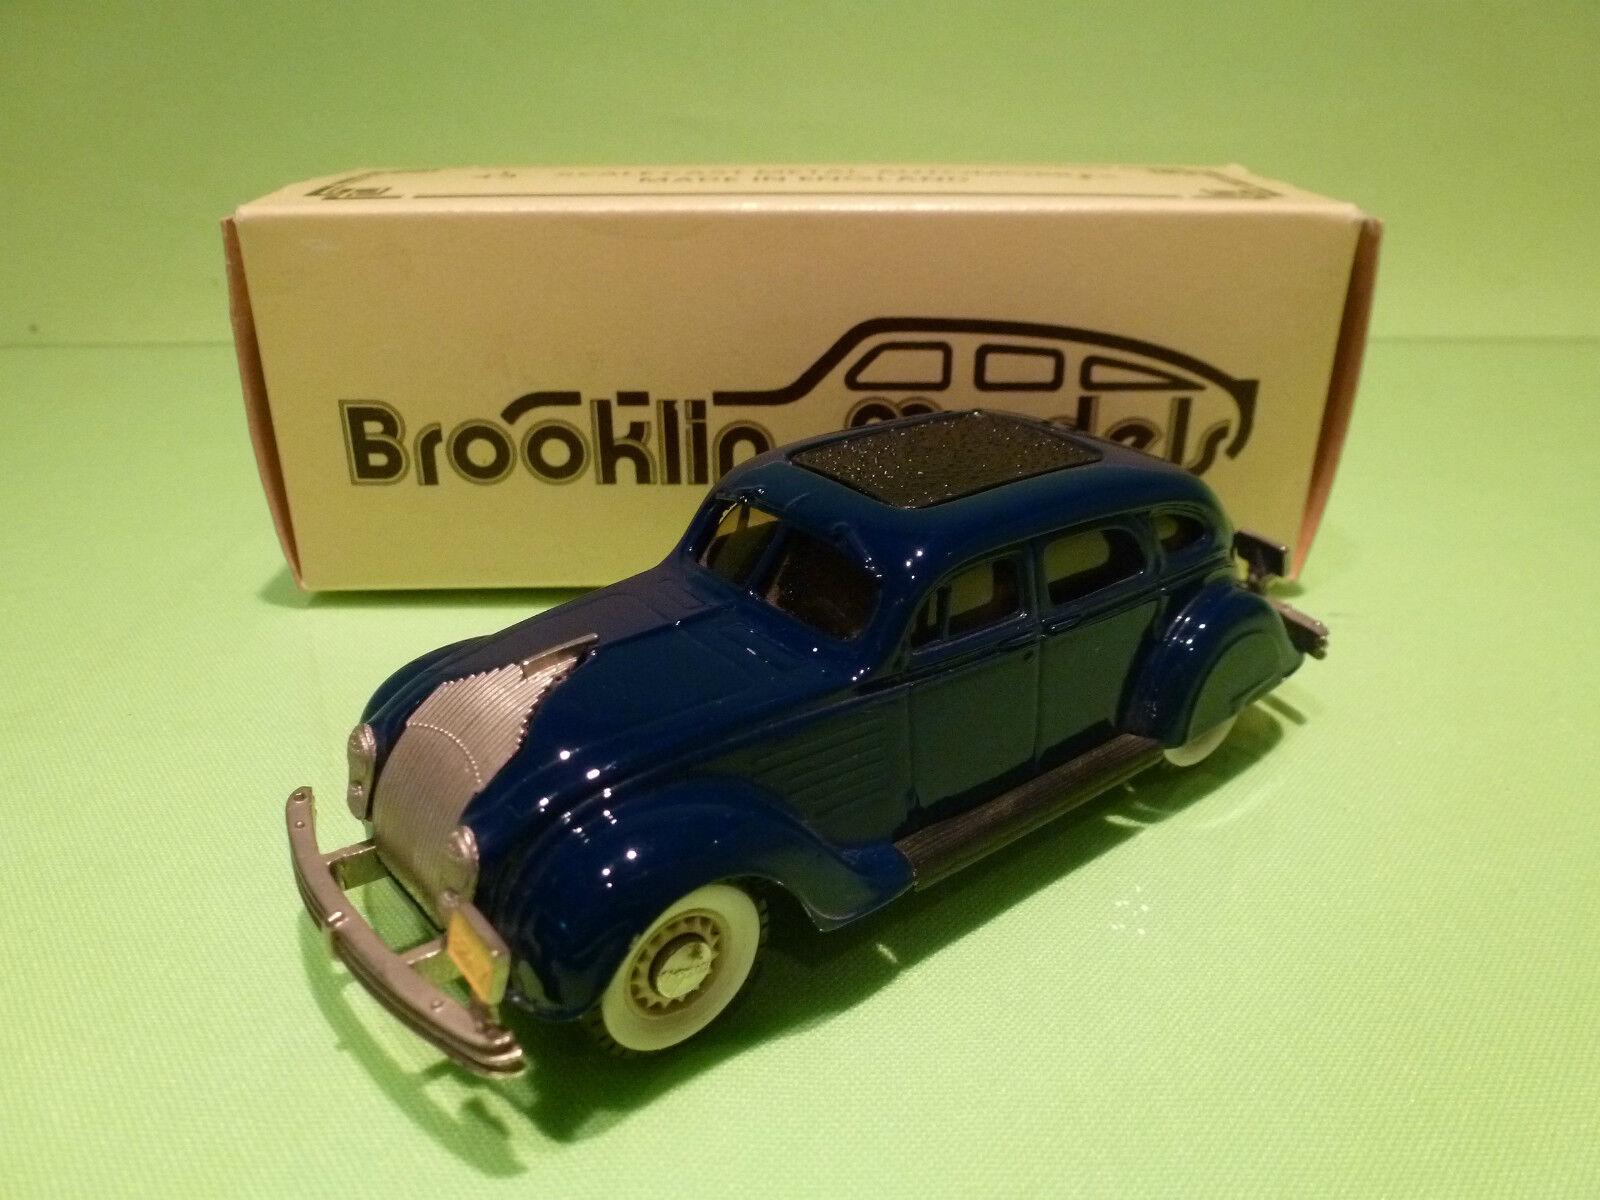 BROOKLIN MODELS BRK 7 CHRYSLER AIRFLOW 4-DOORS 1934 - 1 43 - NEAR MINT IN BOX